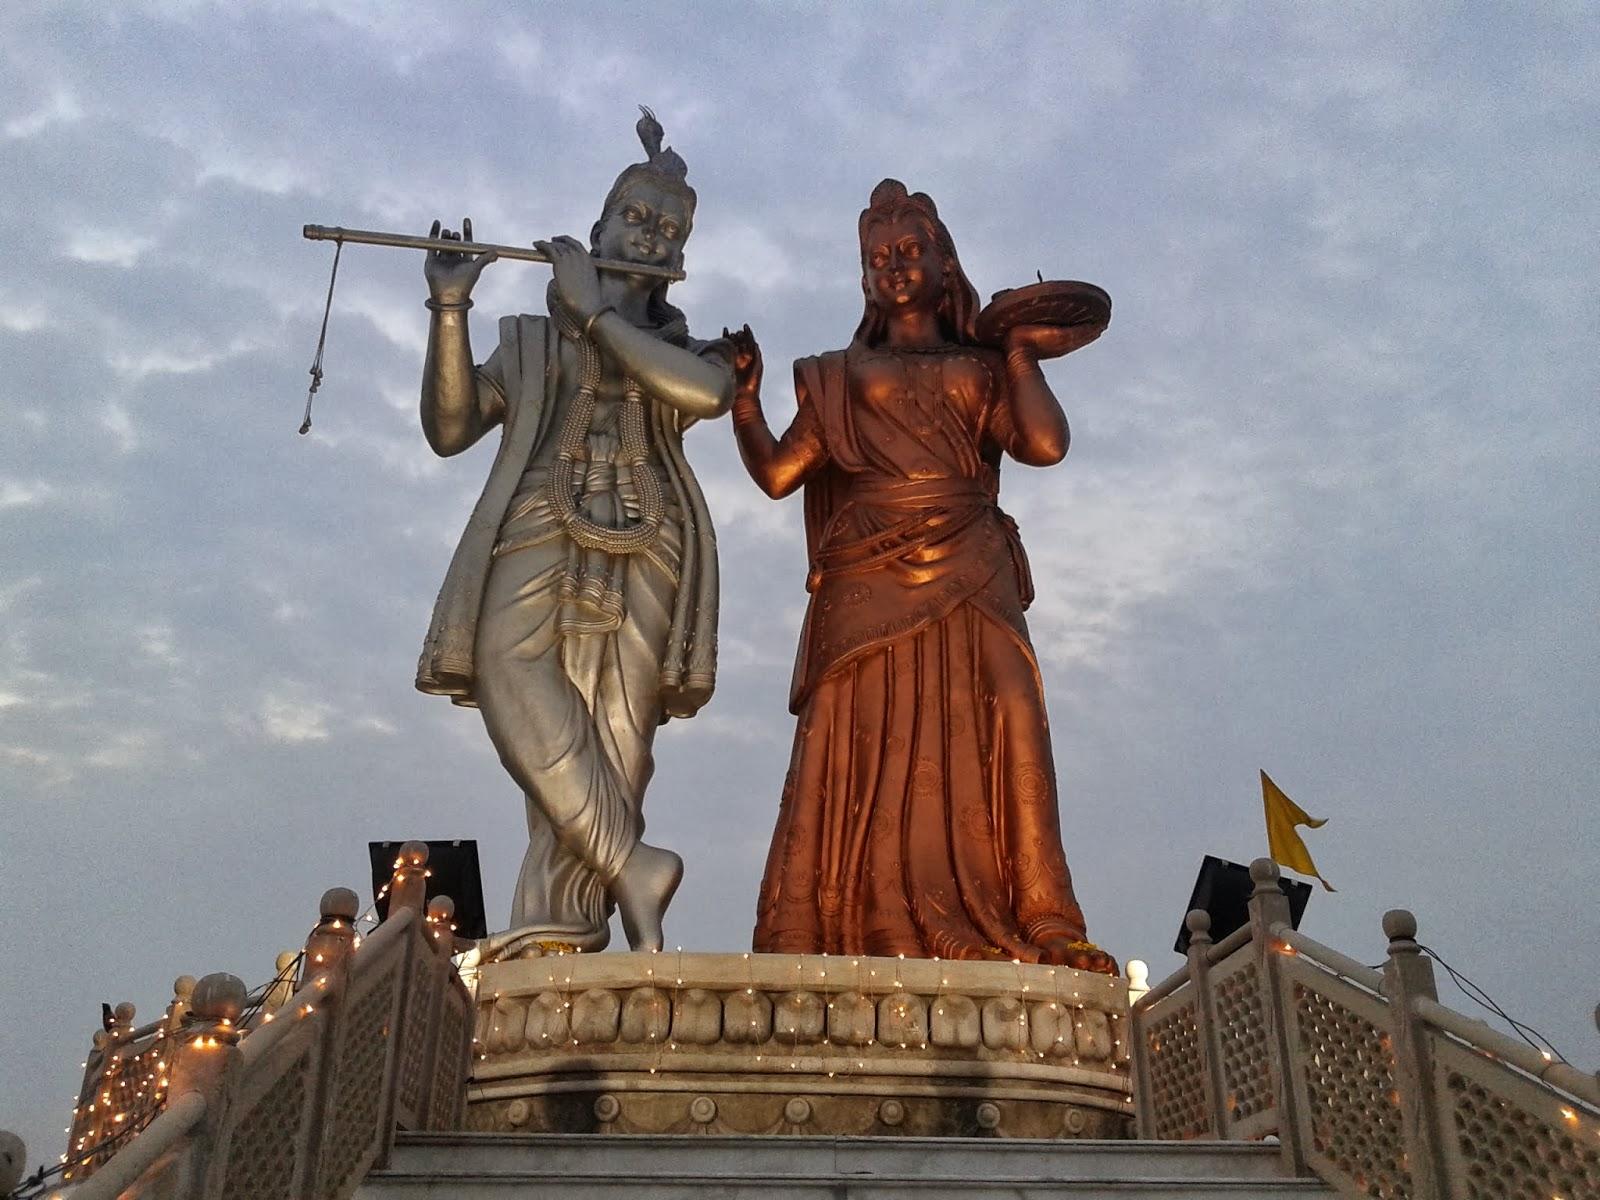 Related to marble krishna statues radha krishna statue gmb